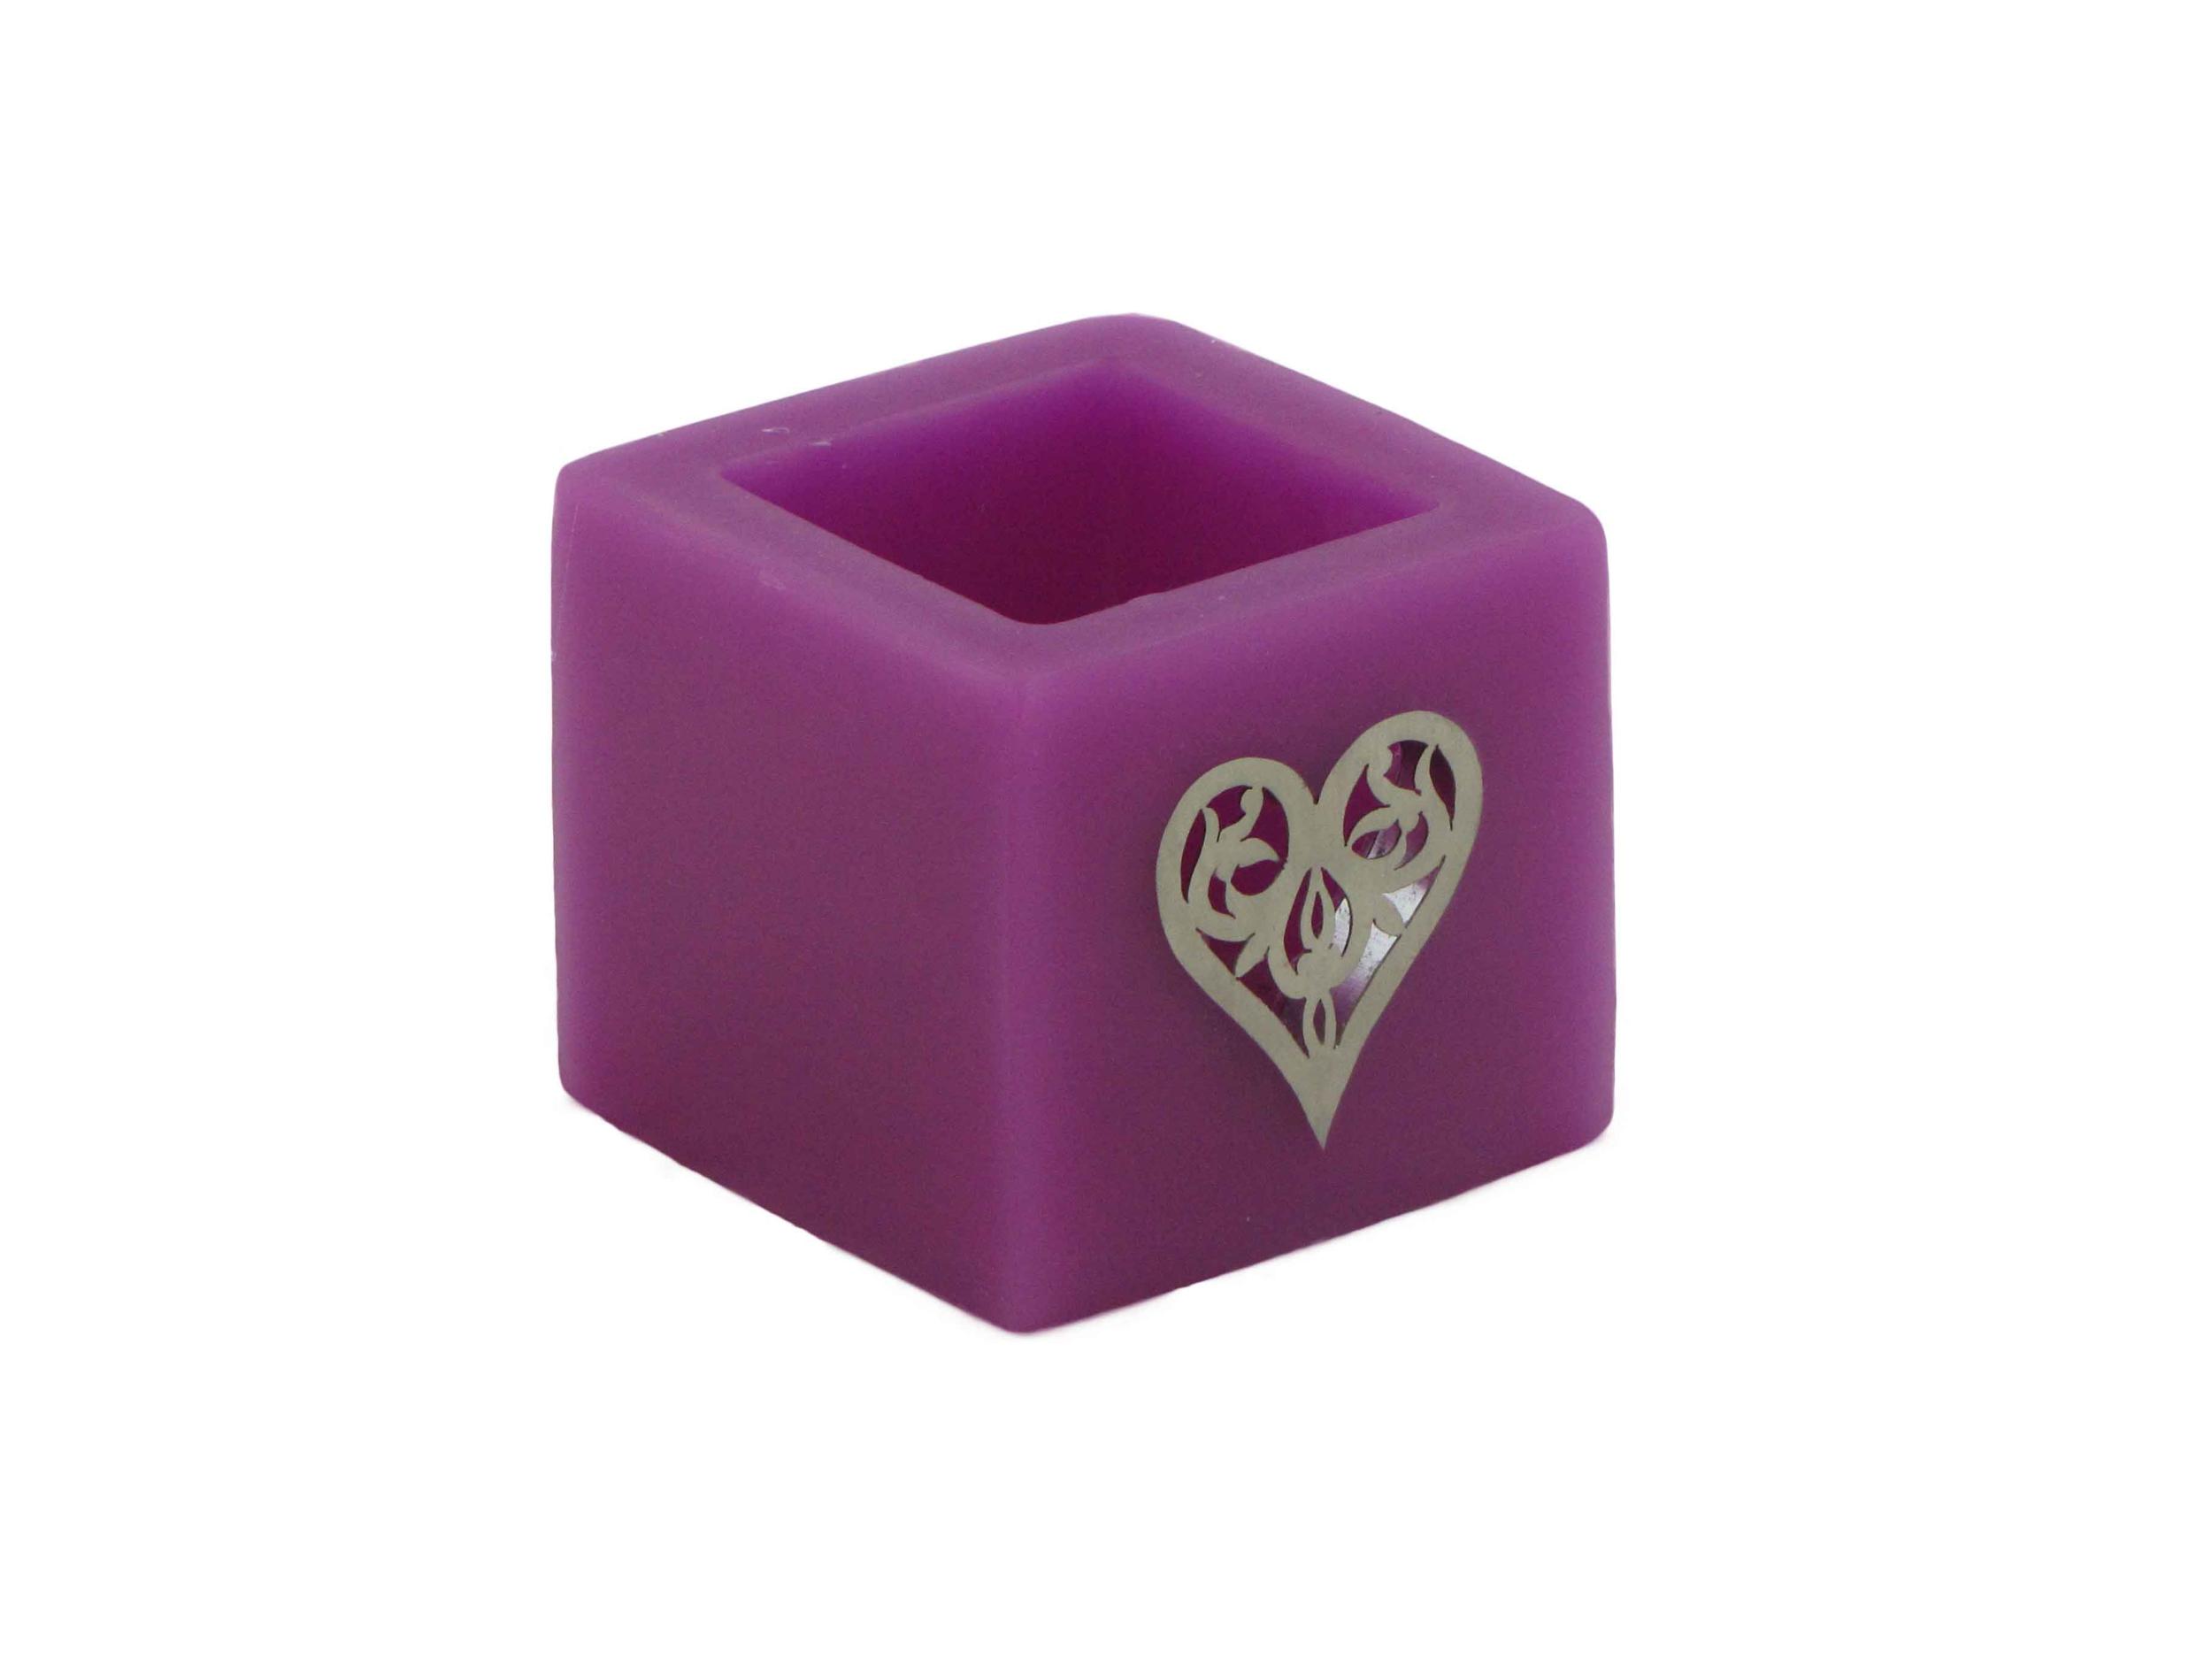 photophore c ur violet photophores en cire. Black Bedroom Furniture Sets. Home Design Ideas